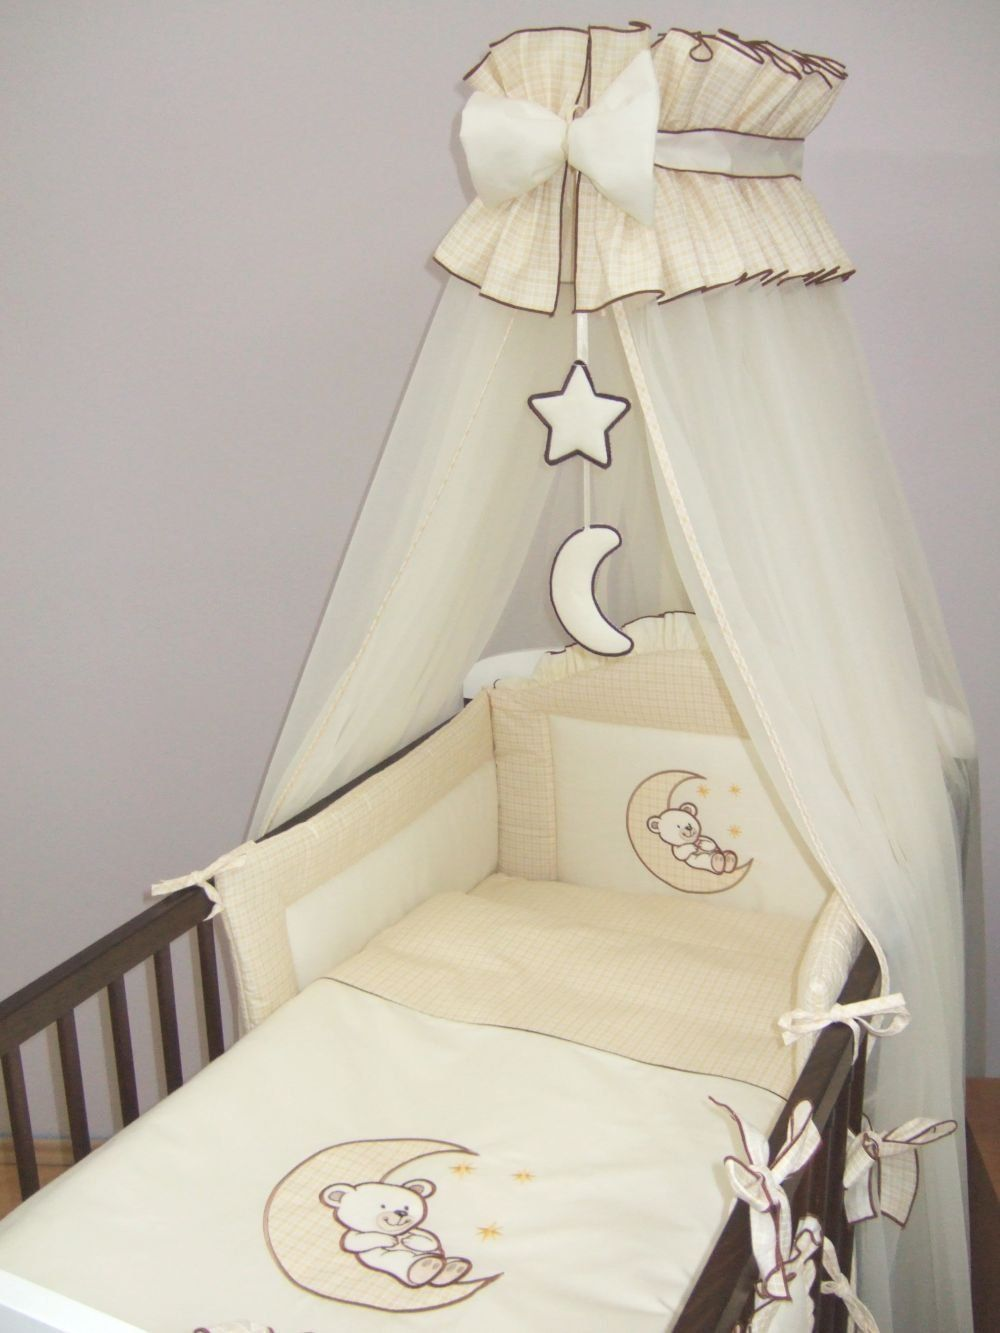 5 piece baby cot bed bedding set moon cot 120 x 60cm